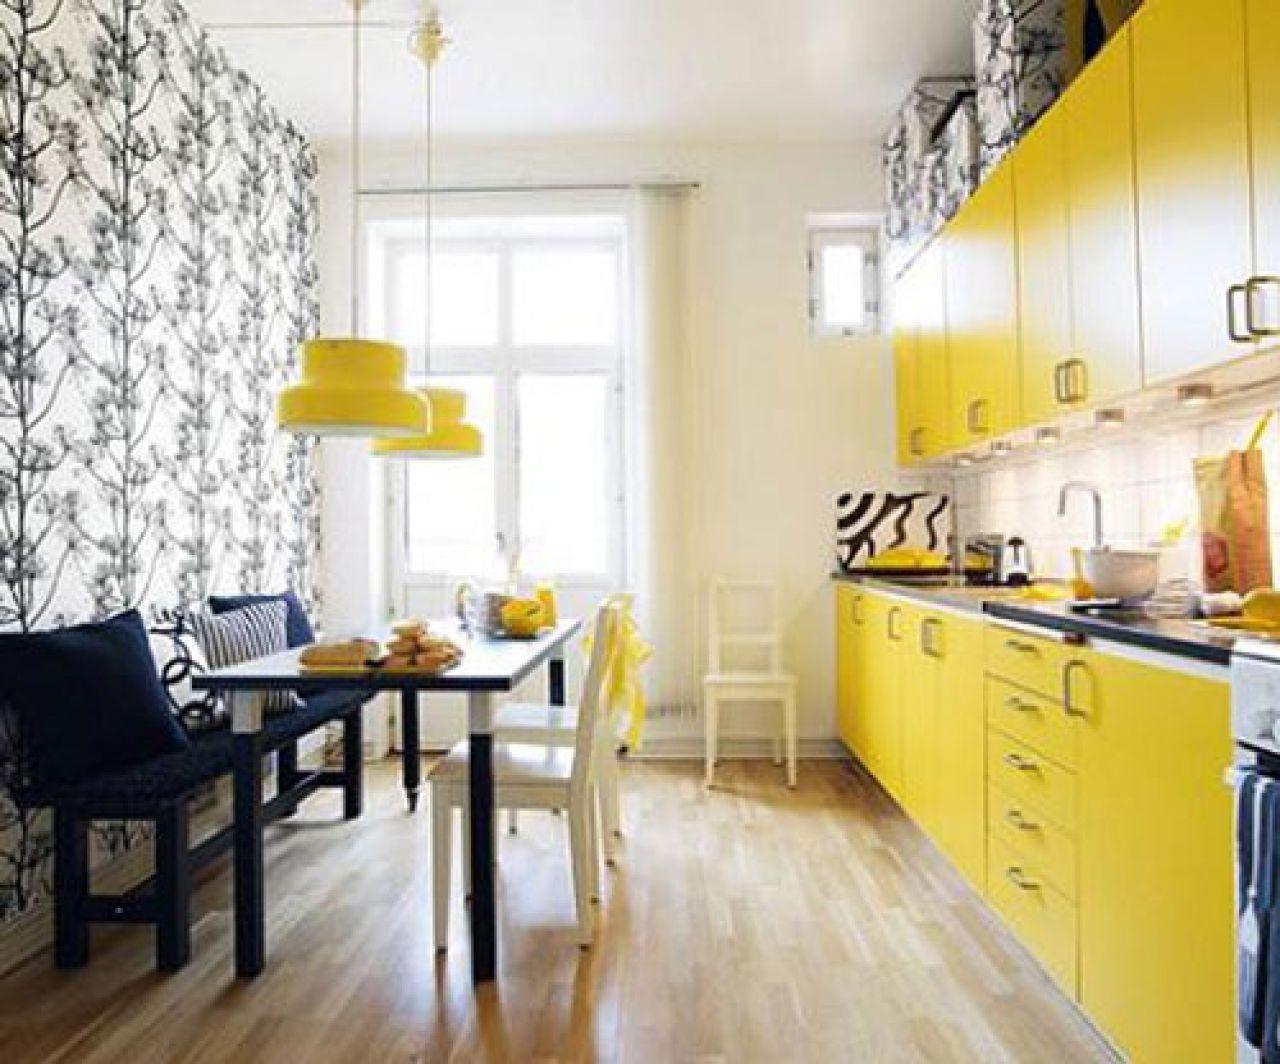 Captivating Country Kitchen Wallpaper Ideas Kitchen Wallpaper ...